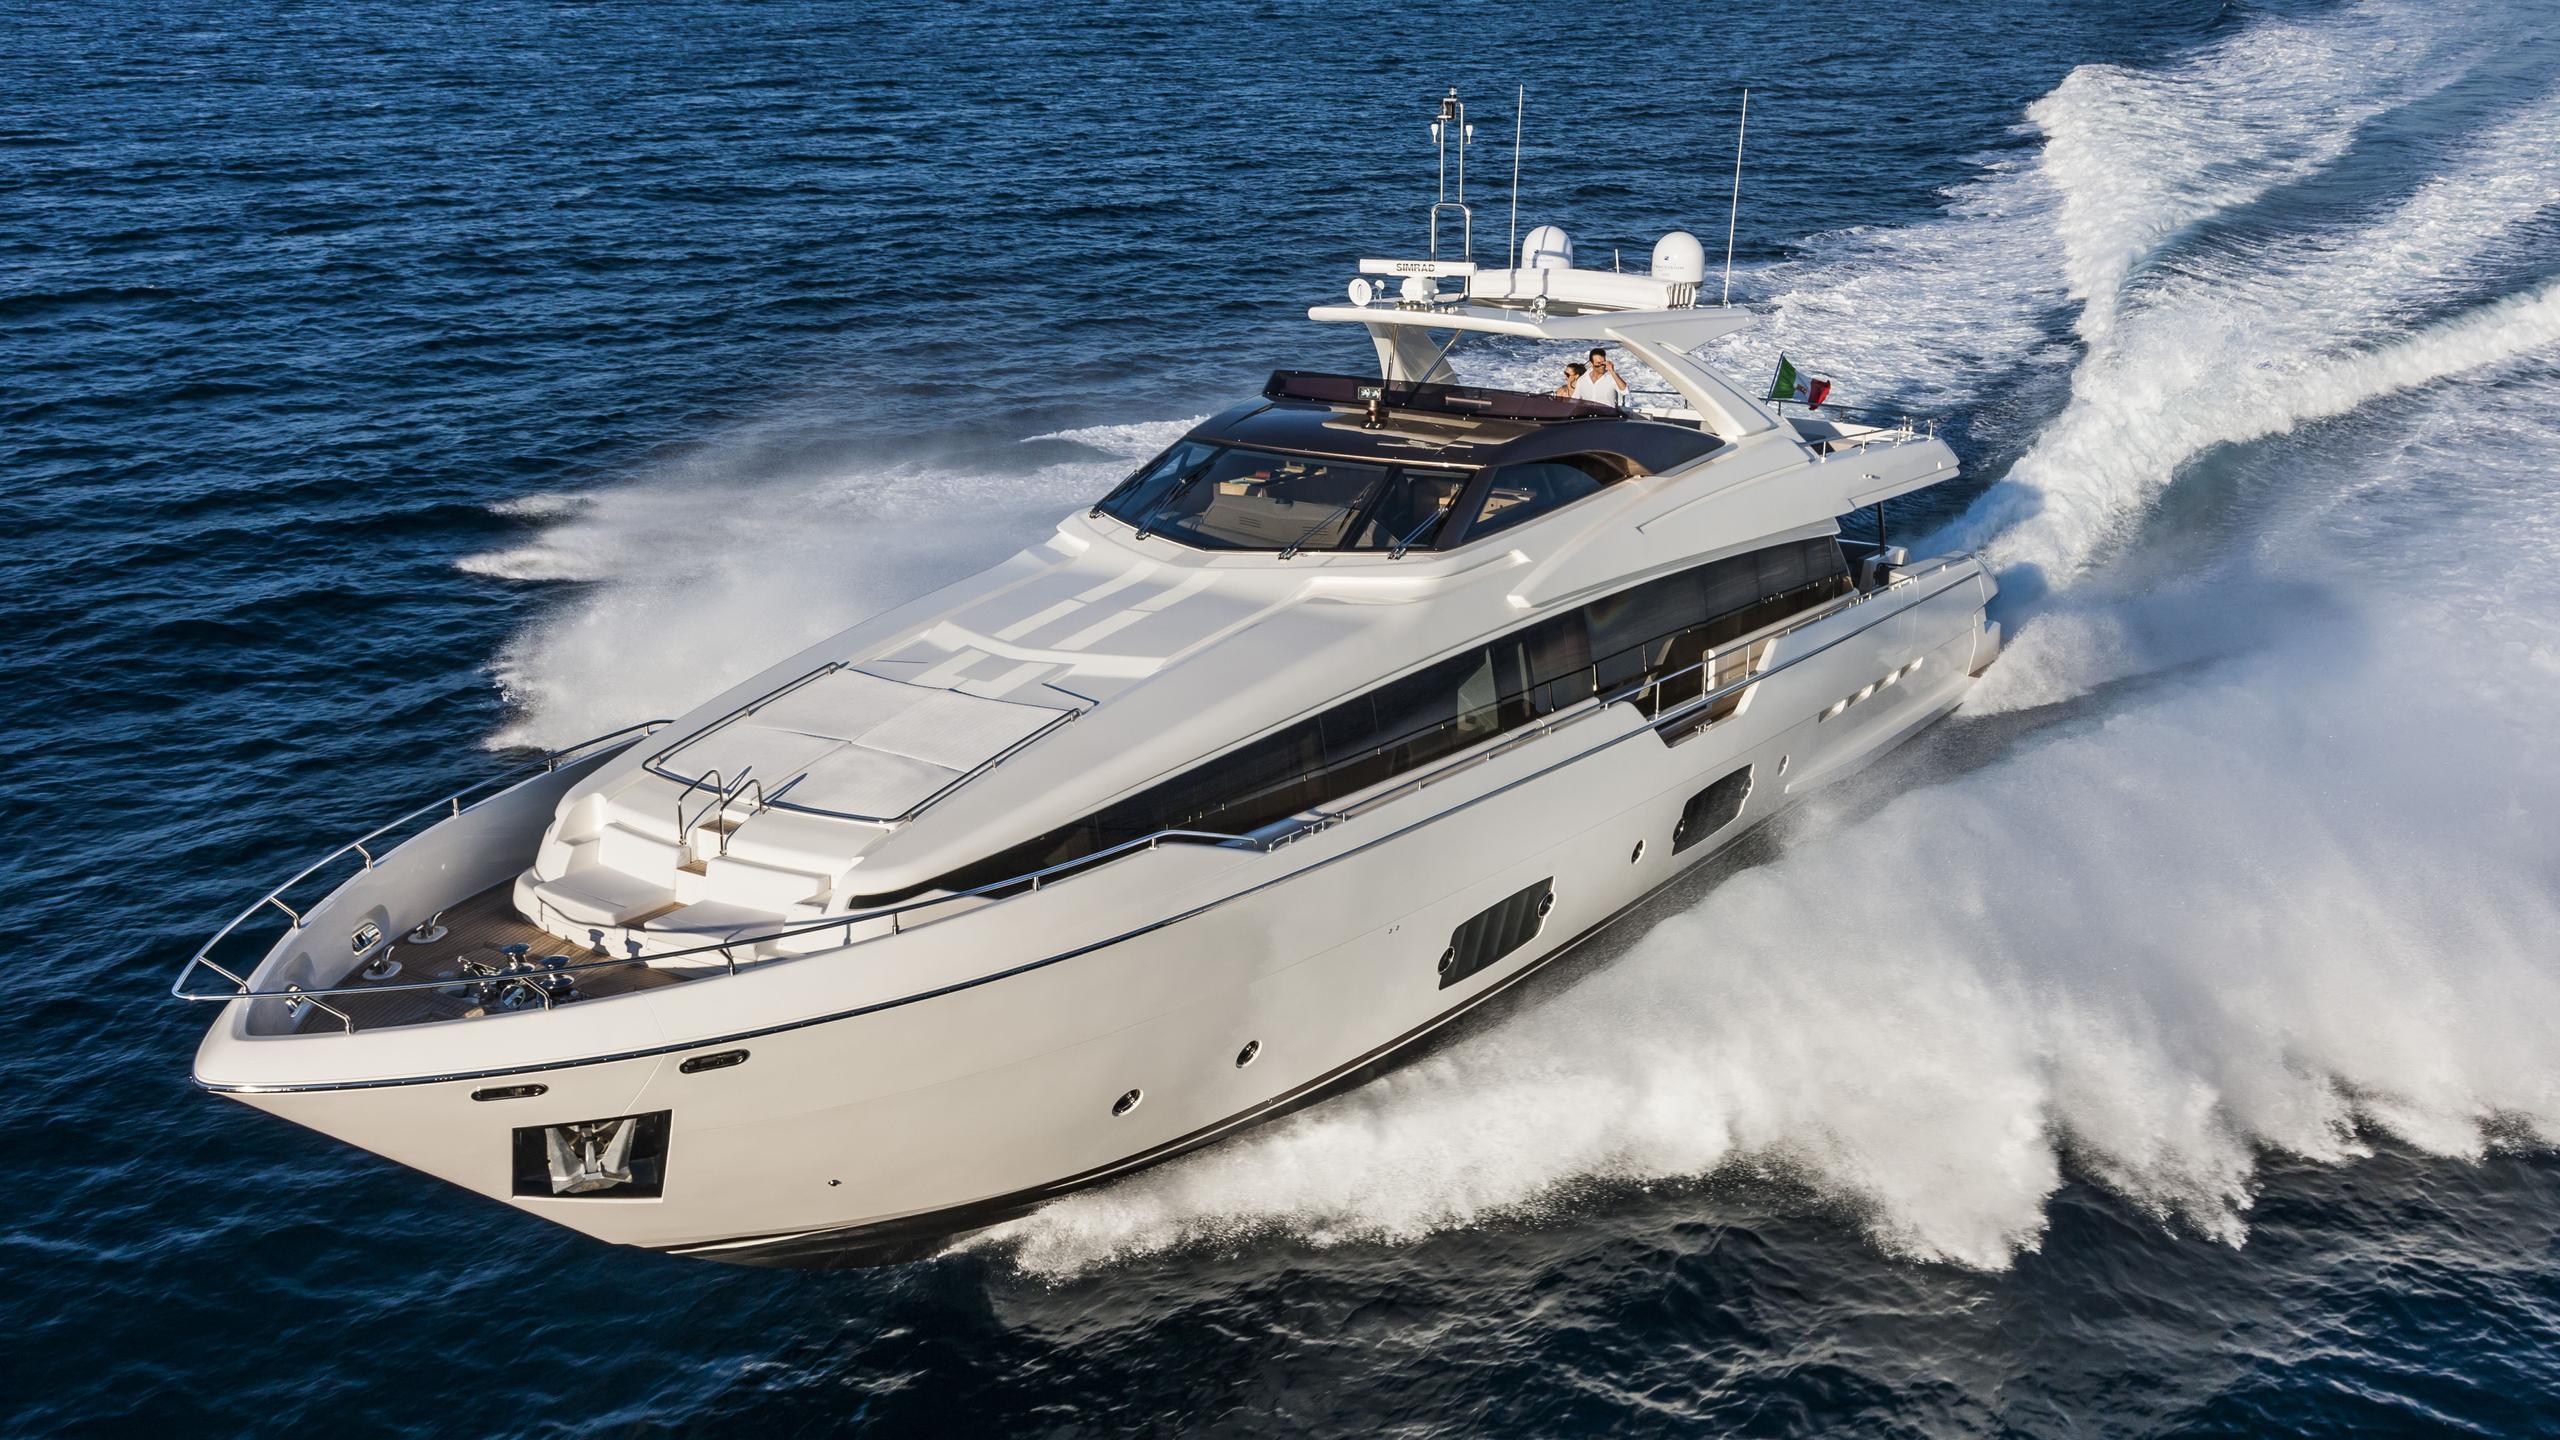 aleksandra-motor-yacht-ferretti-960-2014-29m-cruising